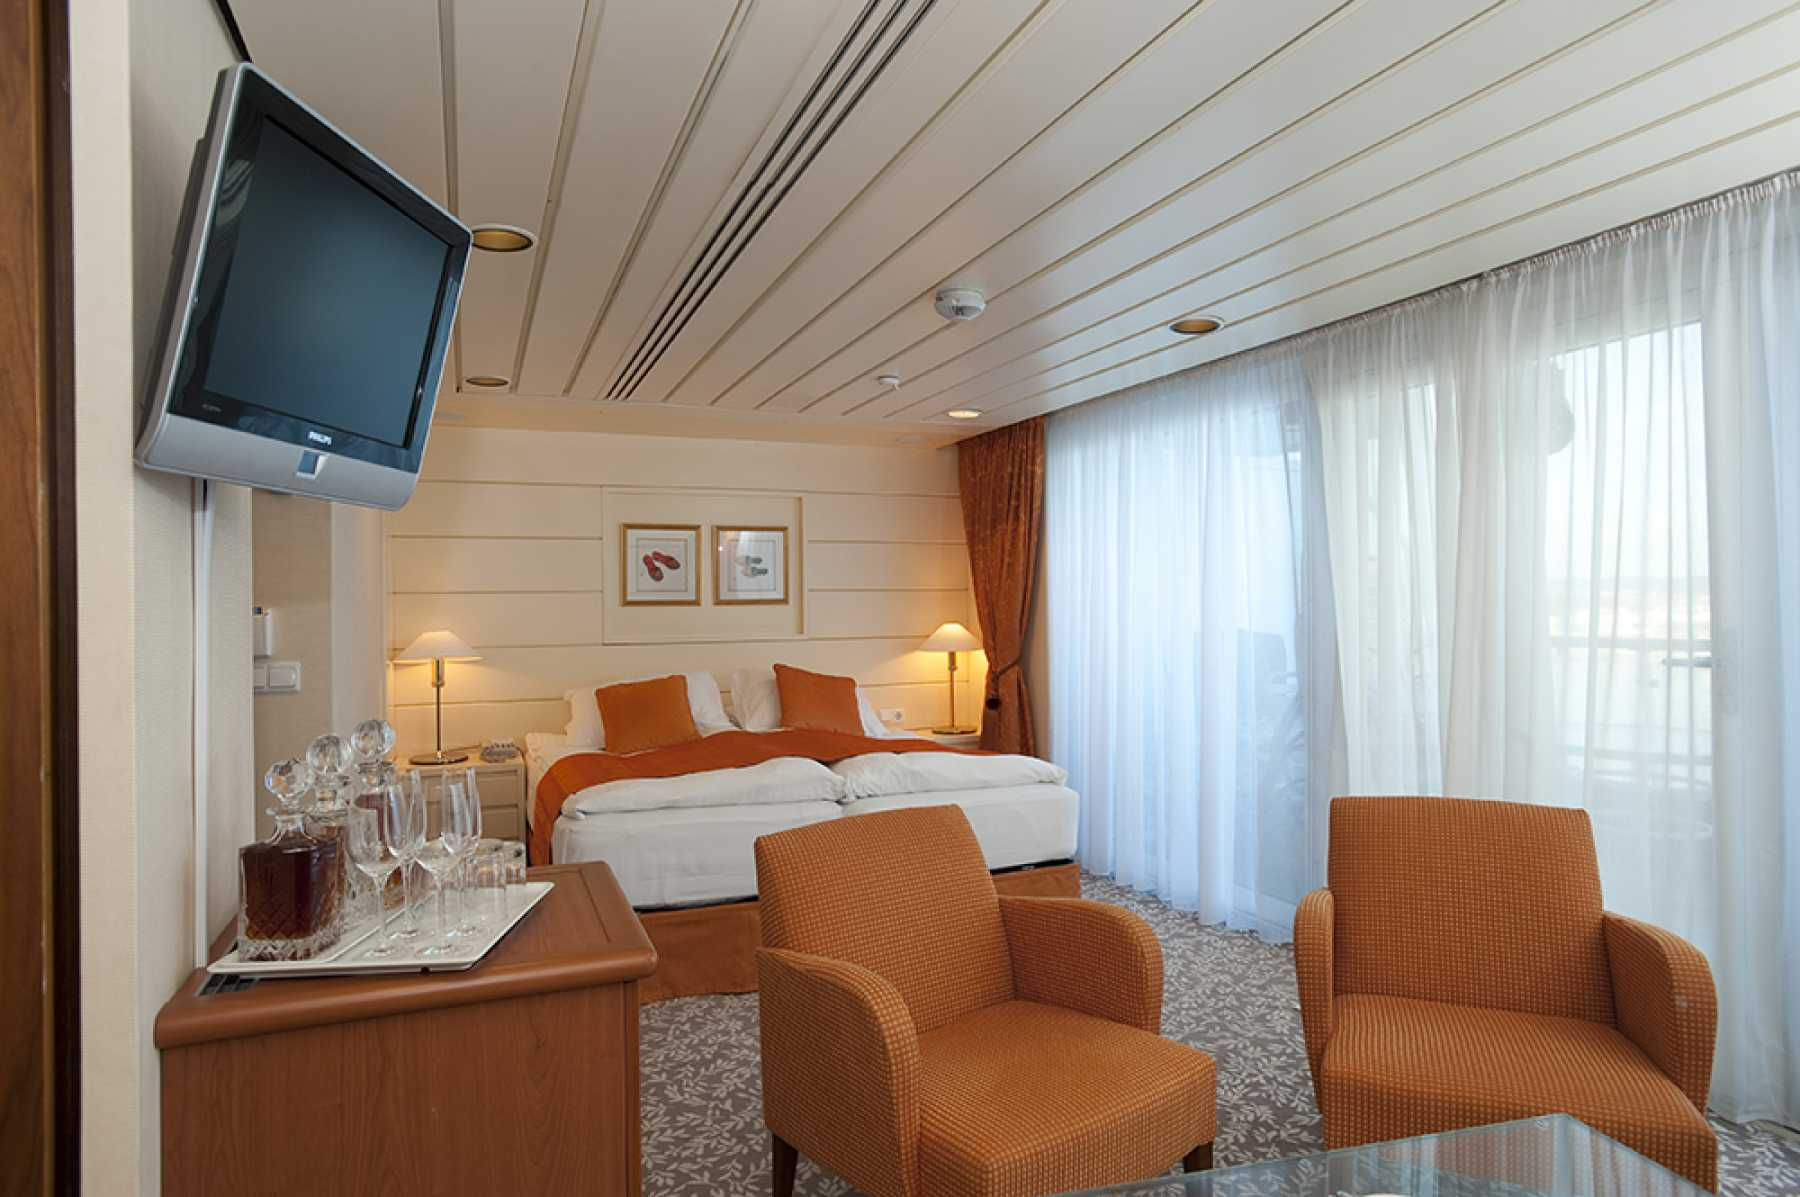 Tv Meubel Avignon Gamma.Cruise Select Netherlands Belgium City Break